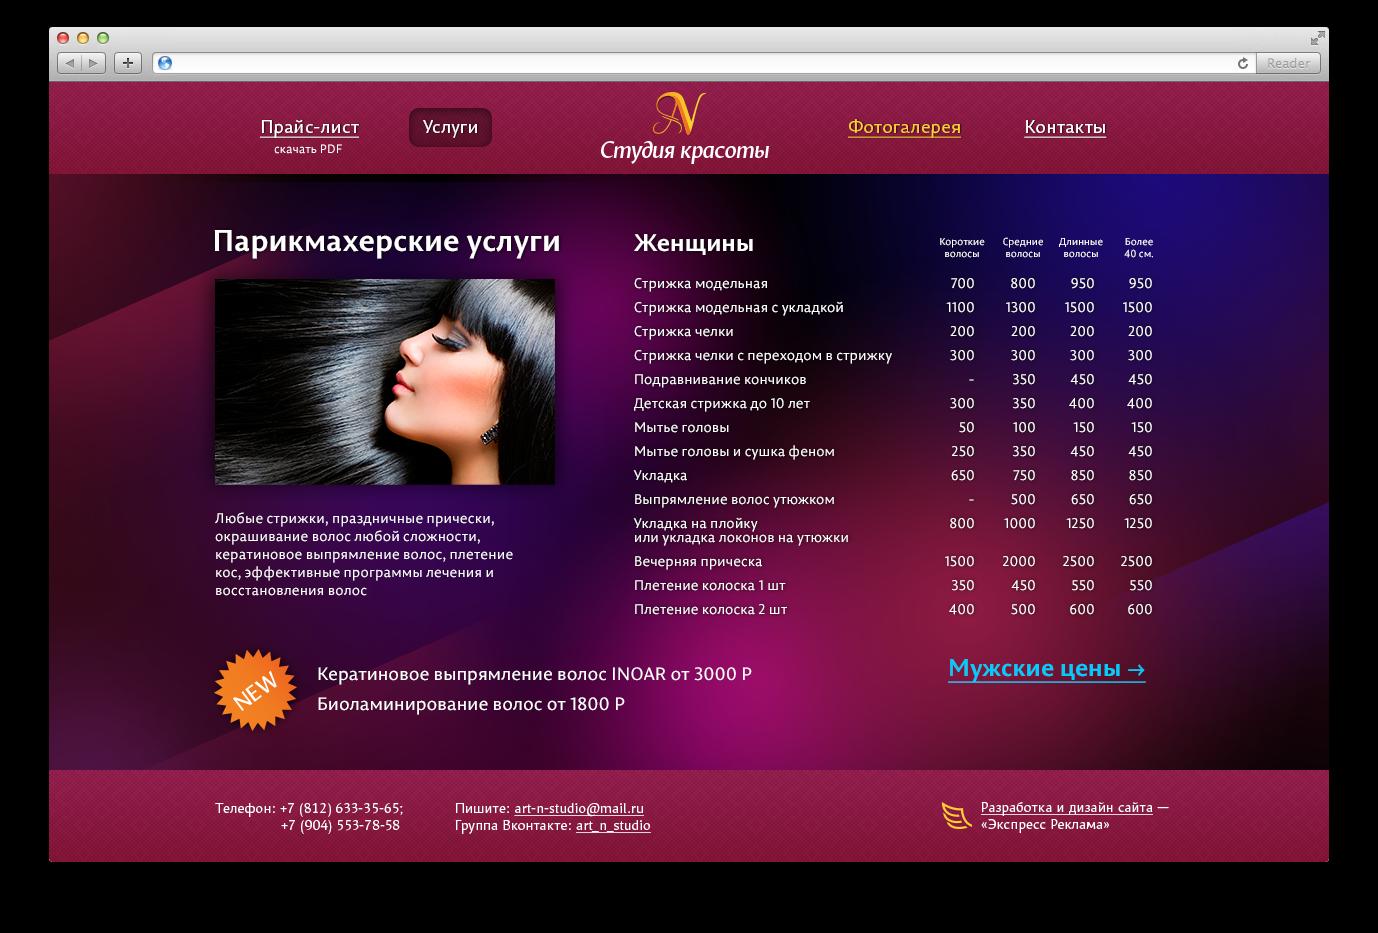 parikmaherskie_page_covered